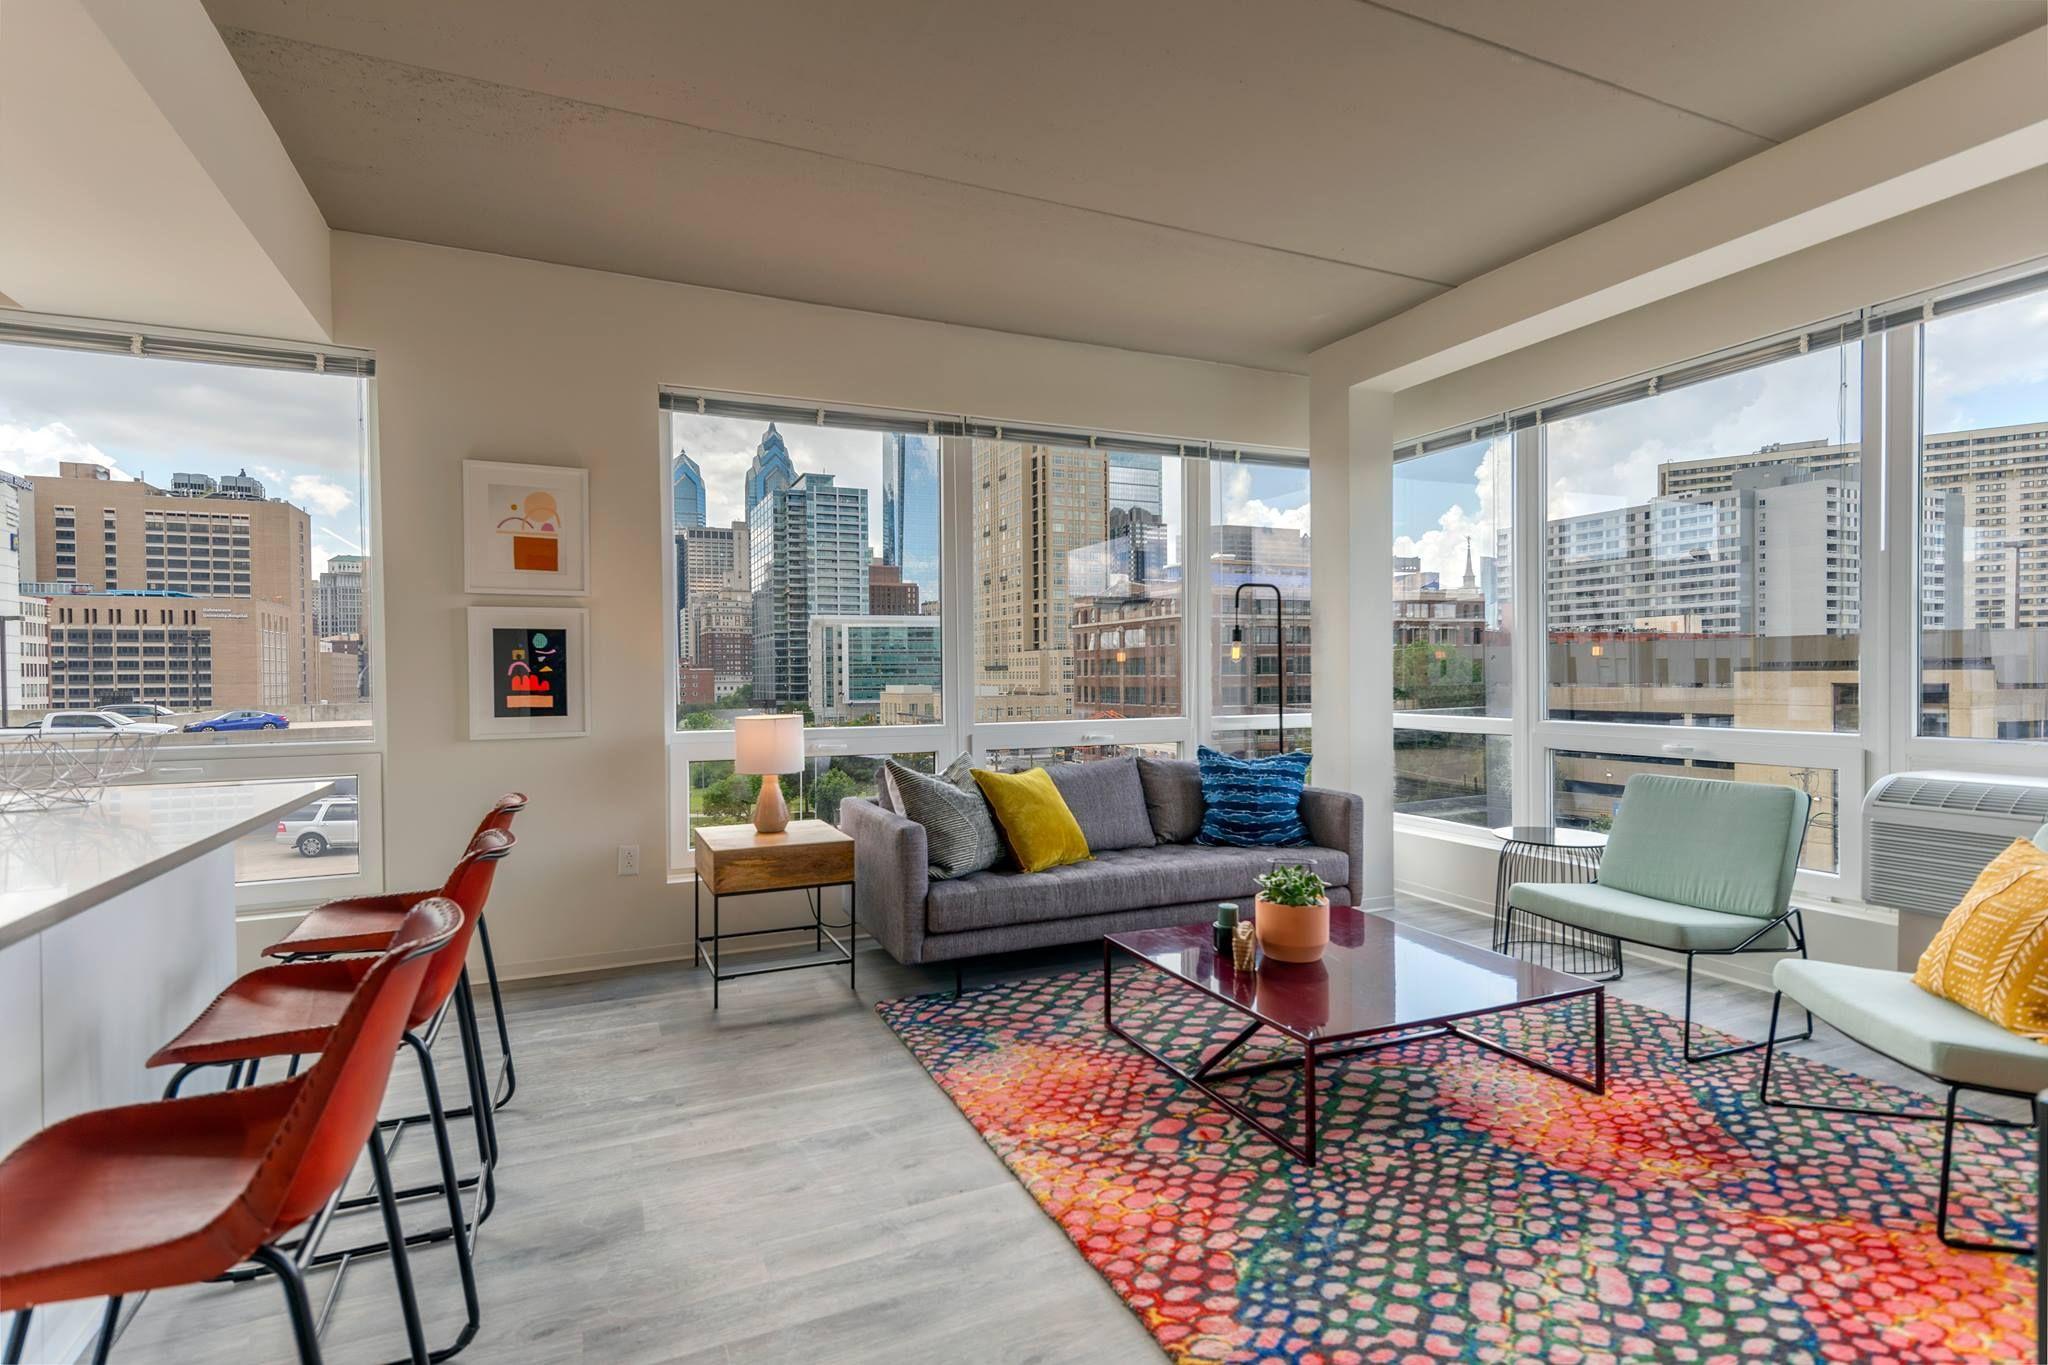 The Hamilton Apartments Philadelphia Pa Ava Smpl Spartansurfaces Floorscore Lvt Interiordes Residential Design Multifamily Housing Interior Design